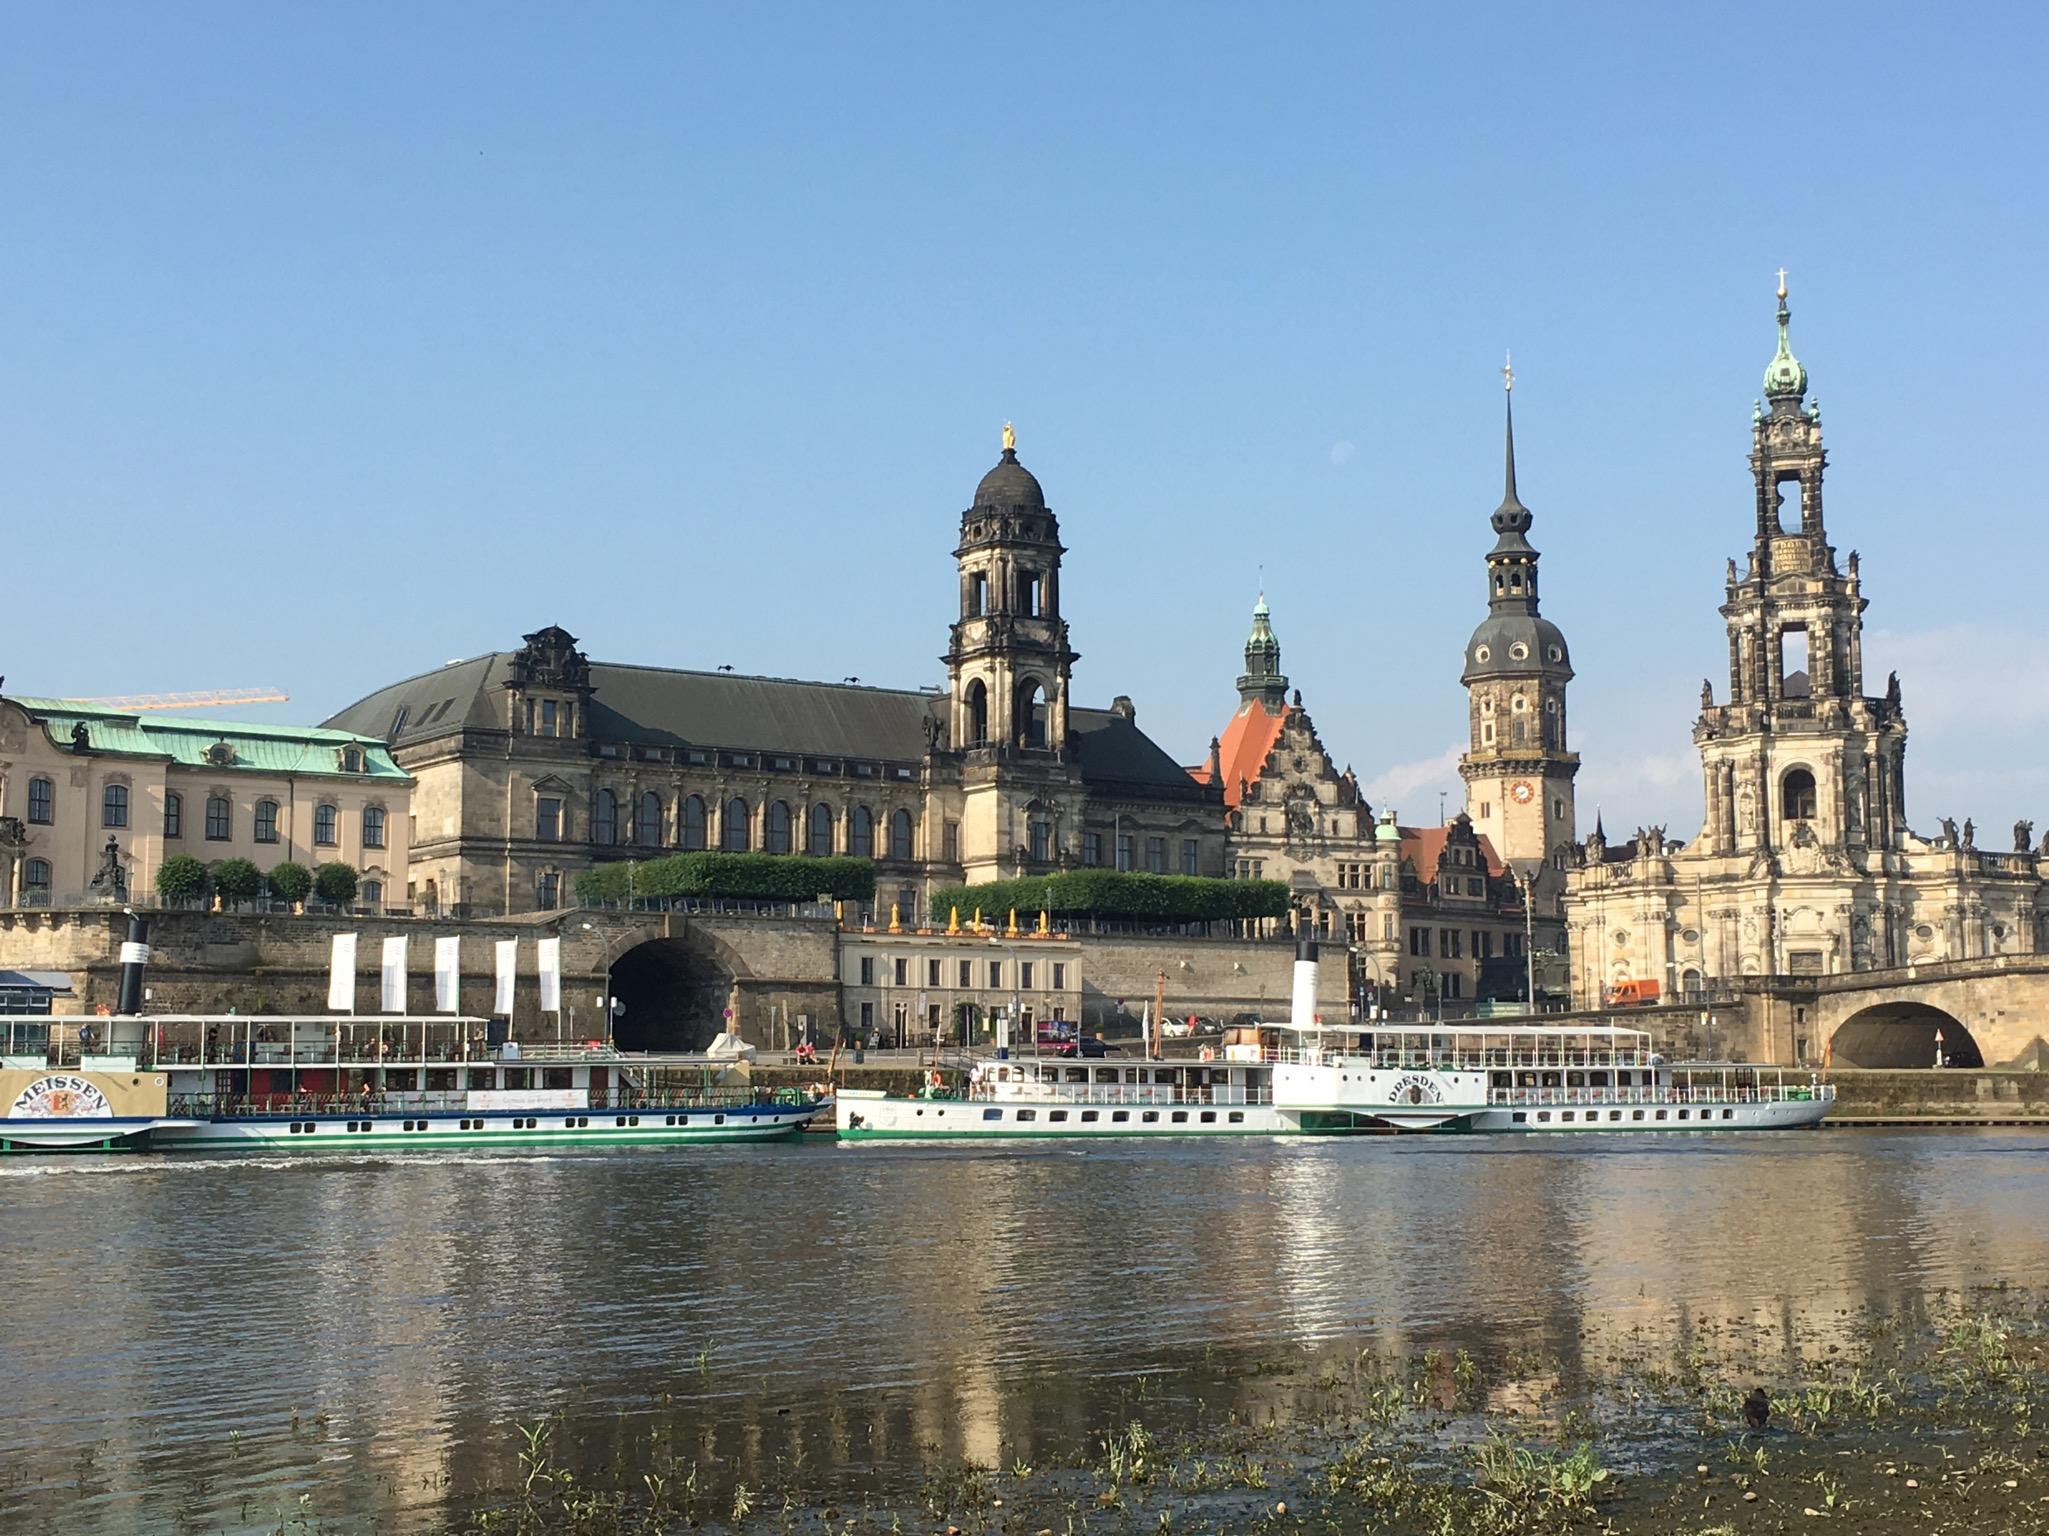 Things to do in Berlin - Dresden